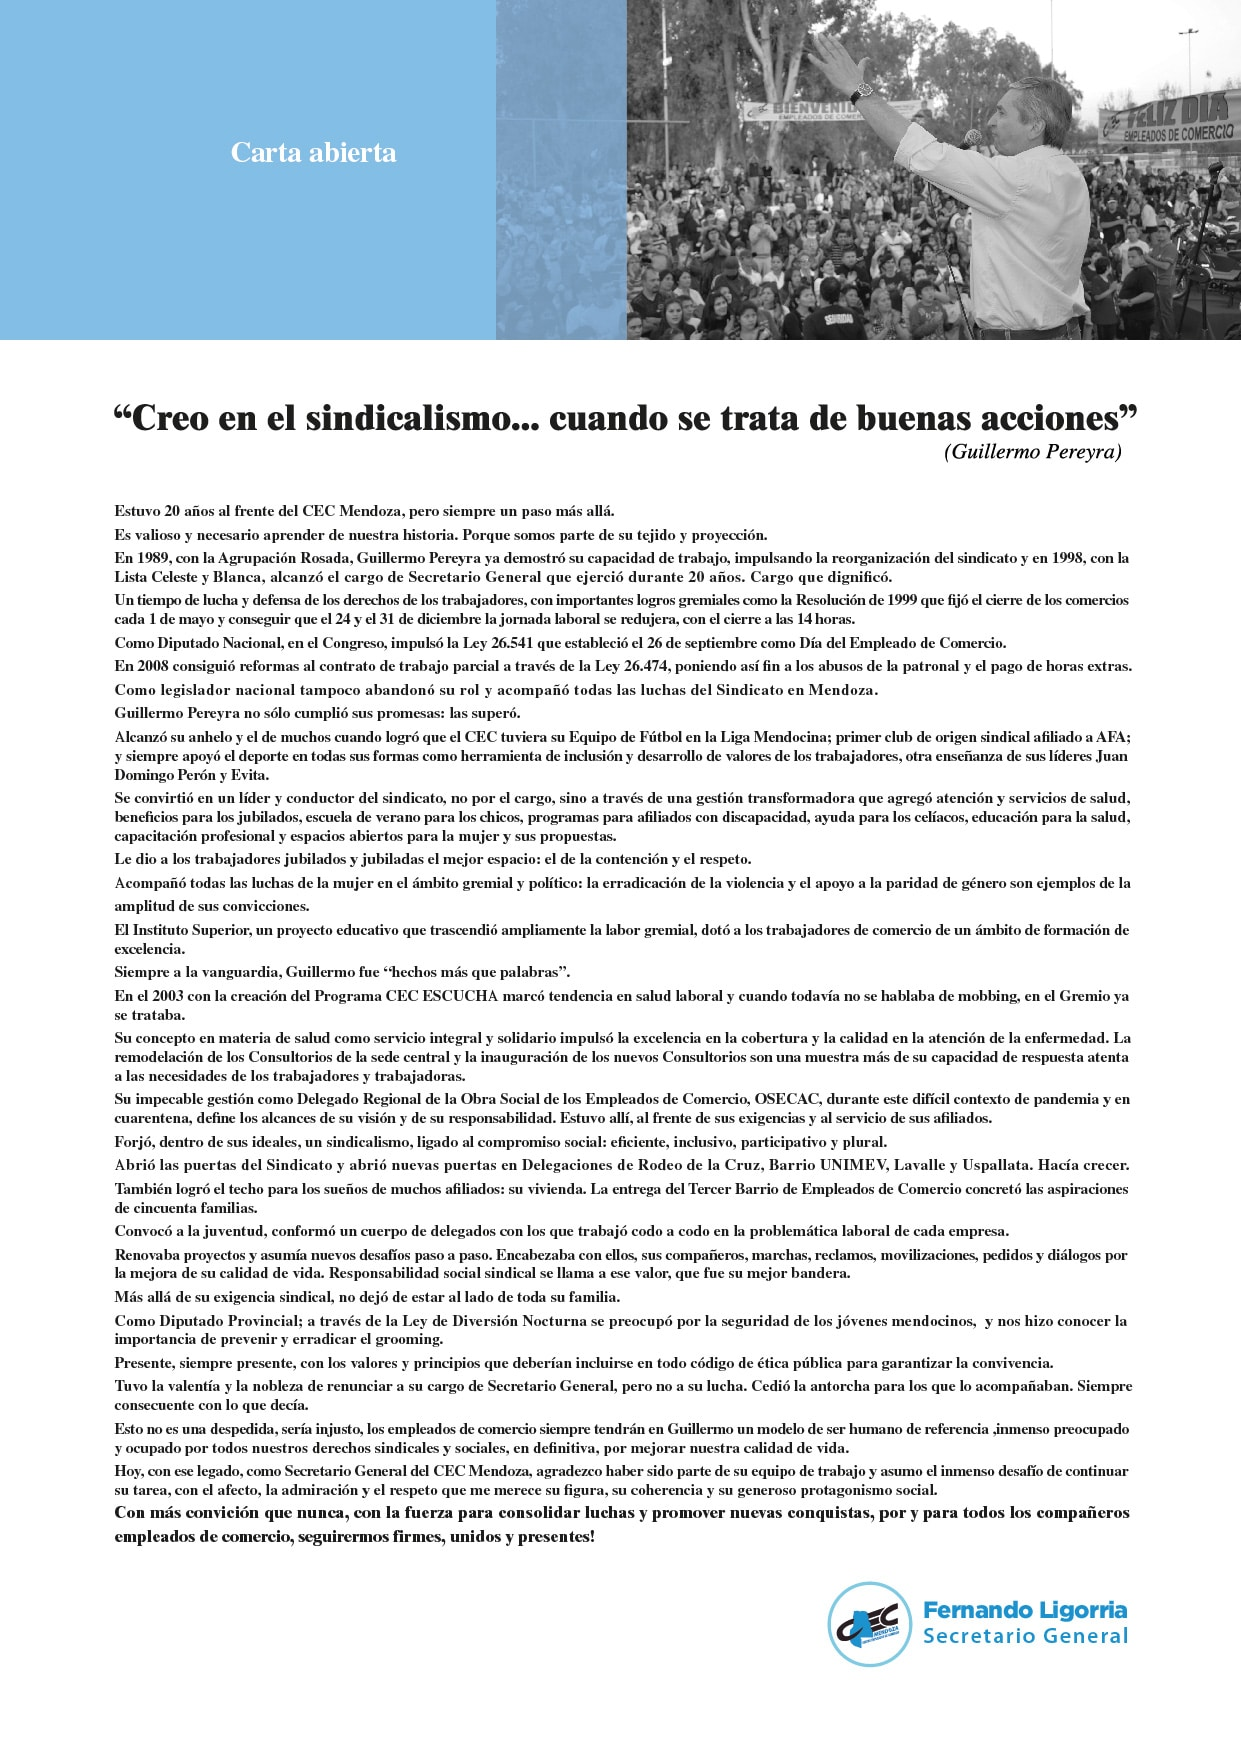 Carta Abierta Guillermo Pereyra